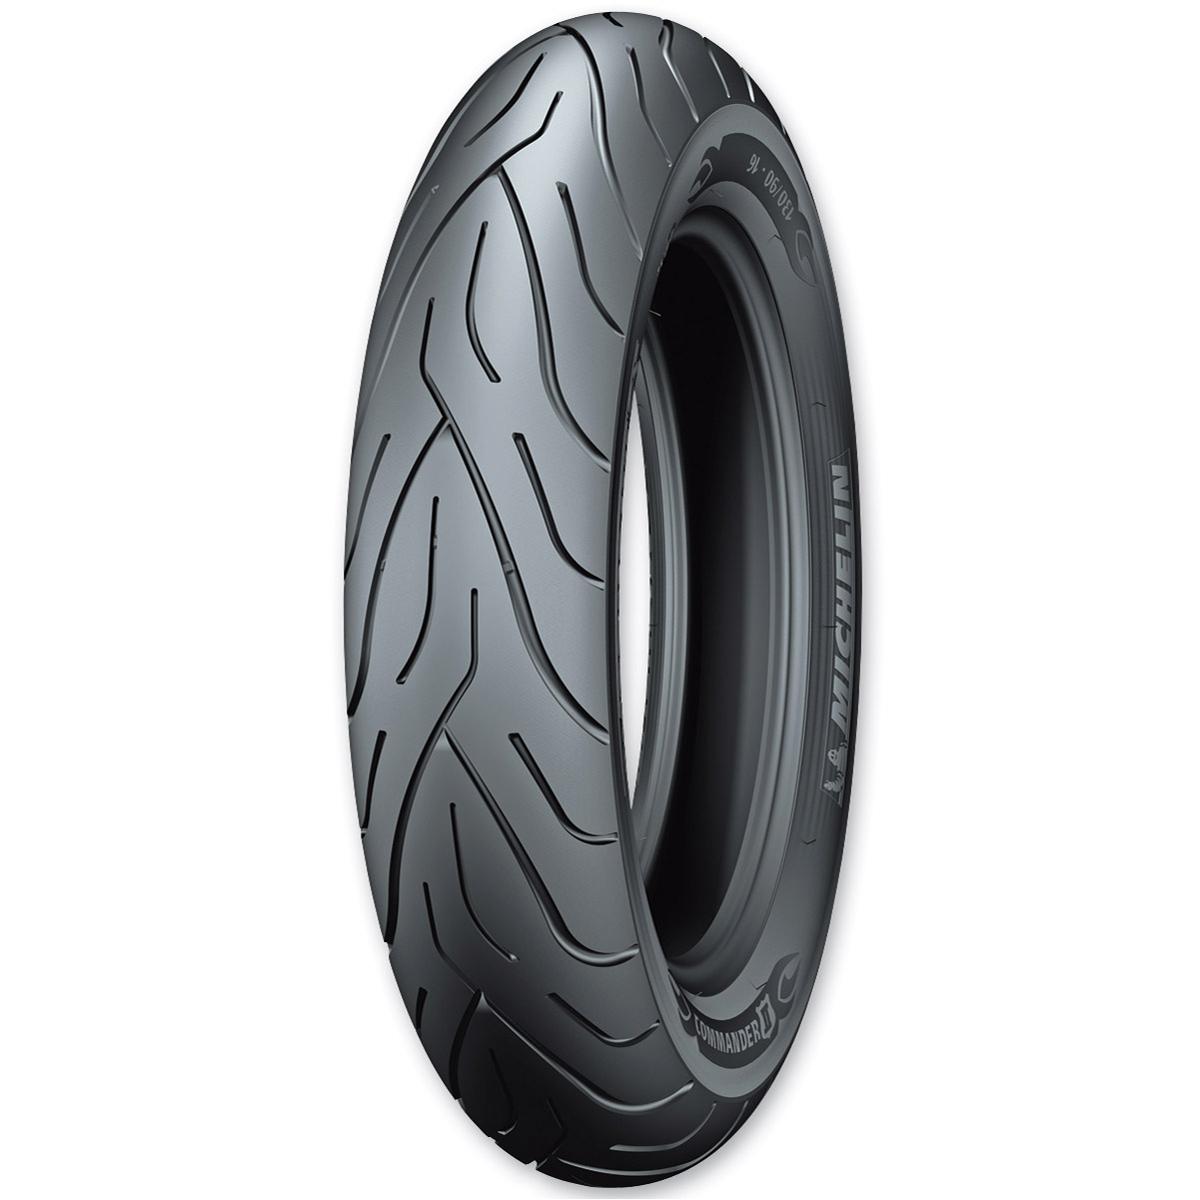 Michelin Commander II MT90-B16 Front tire